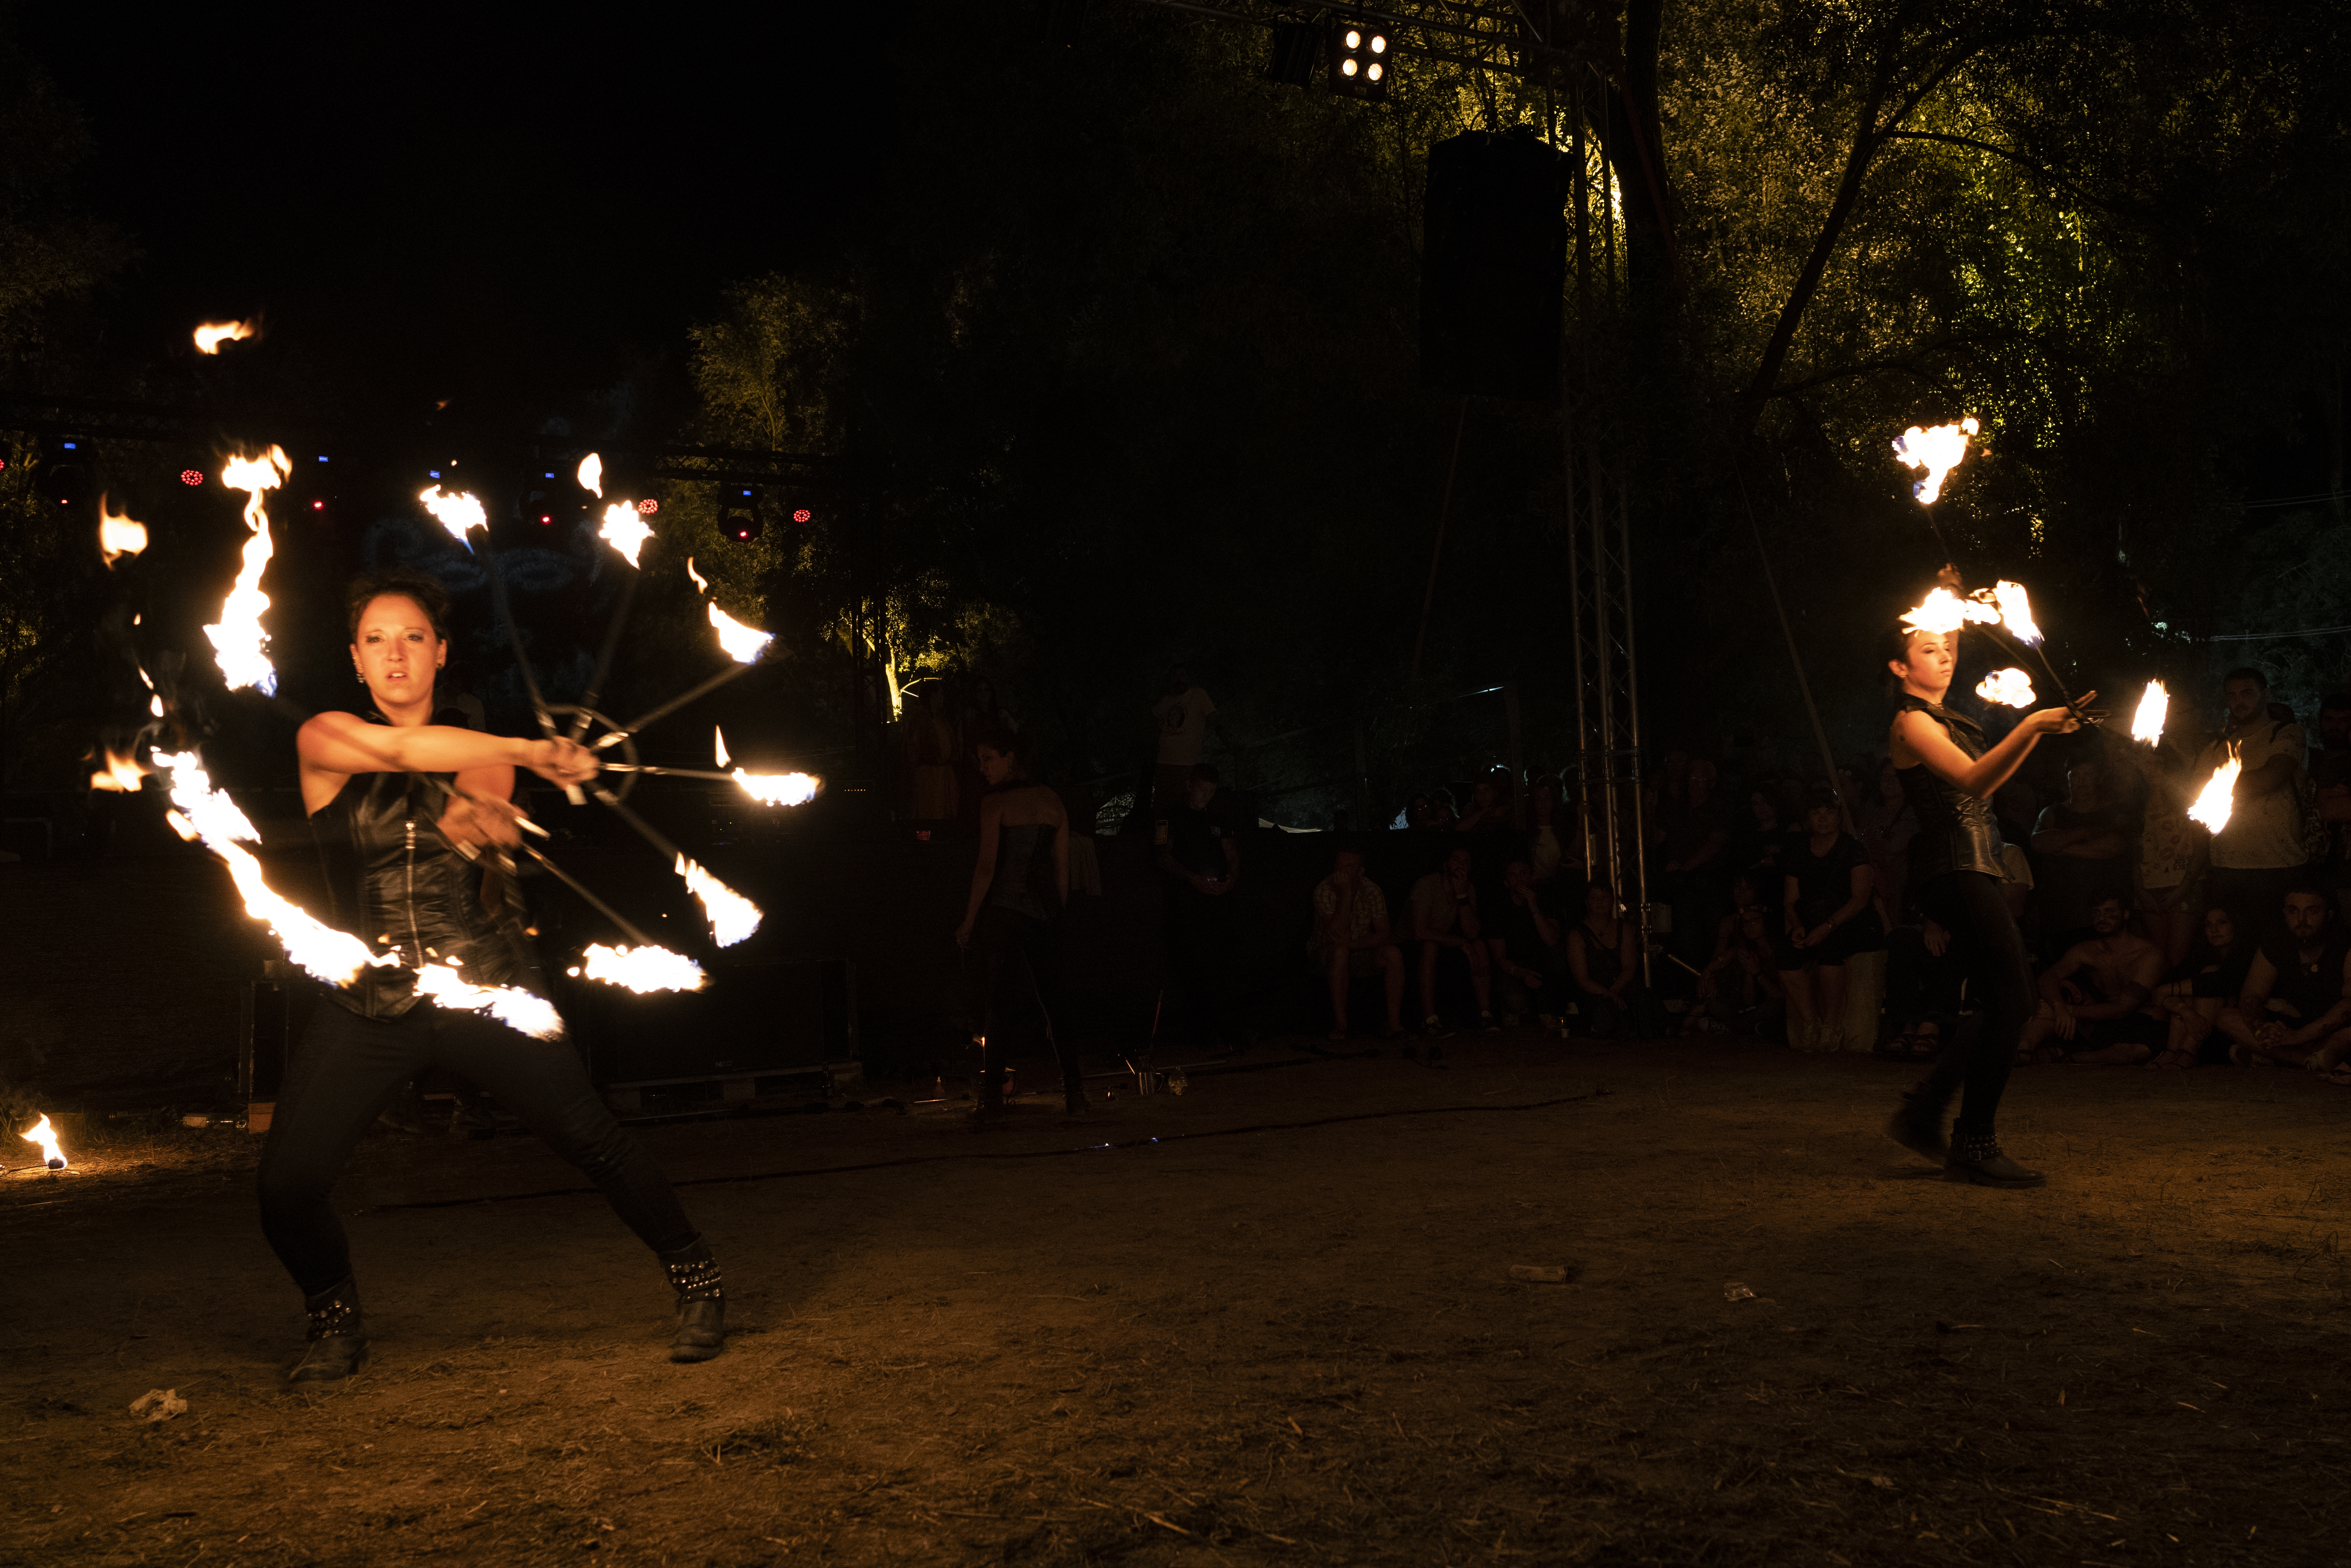 strie fire show fuoco